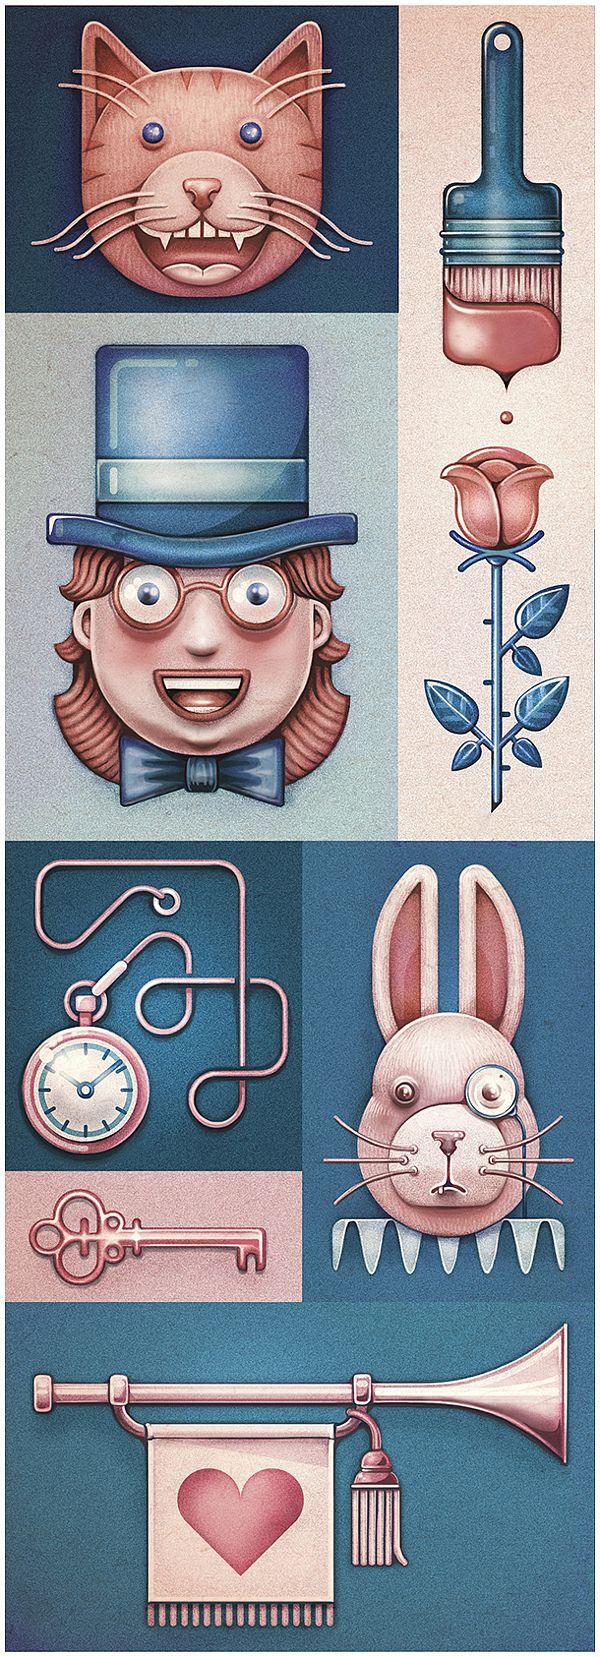 Alice's Adventures in Wonderland by MUTI